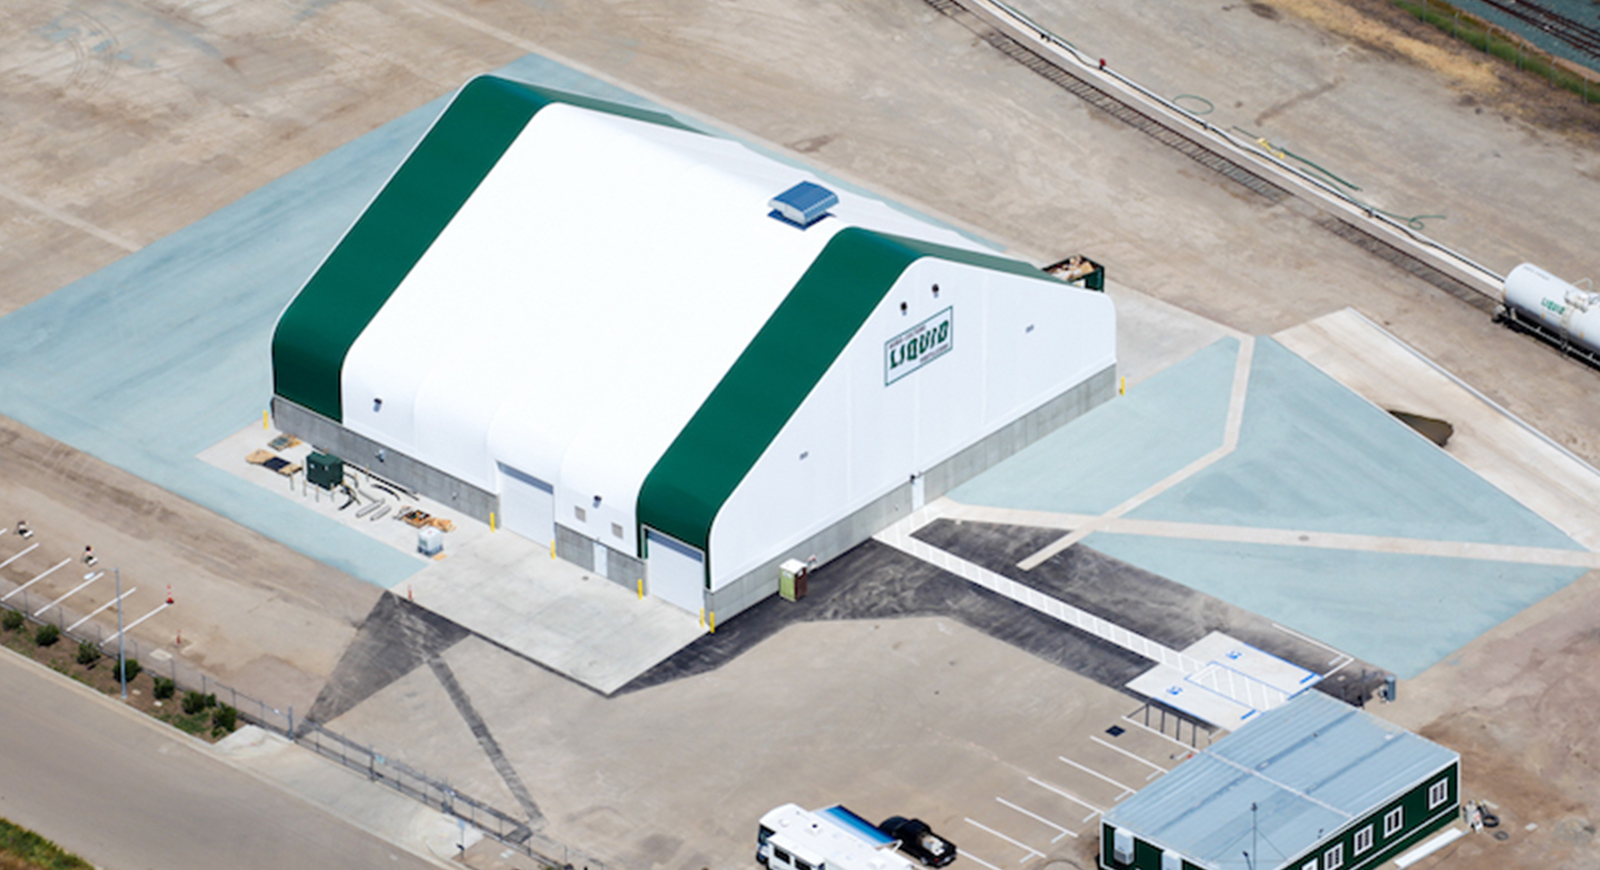 Agro Liquid Fertilizer Industrial Agriculture Farm Construction General Contractor Building